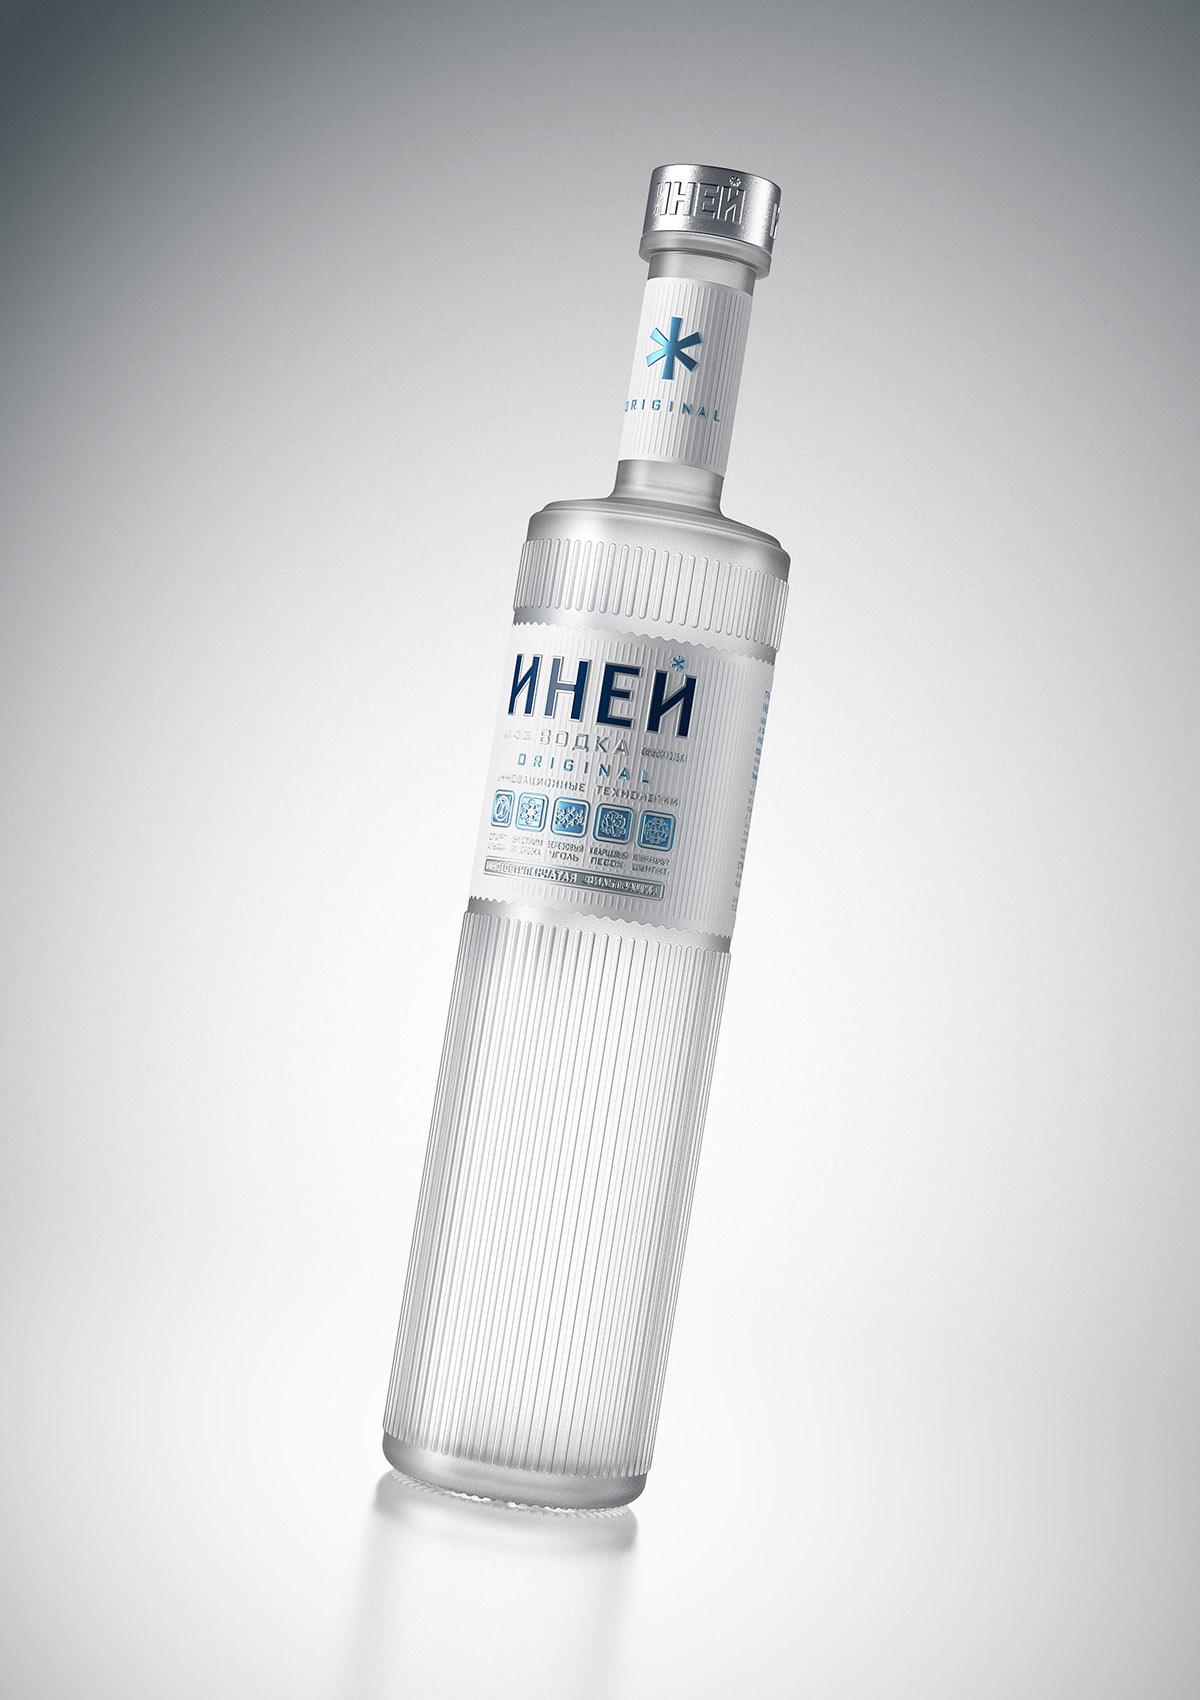 дизайн упаковка водка форма